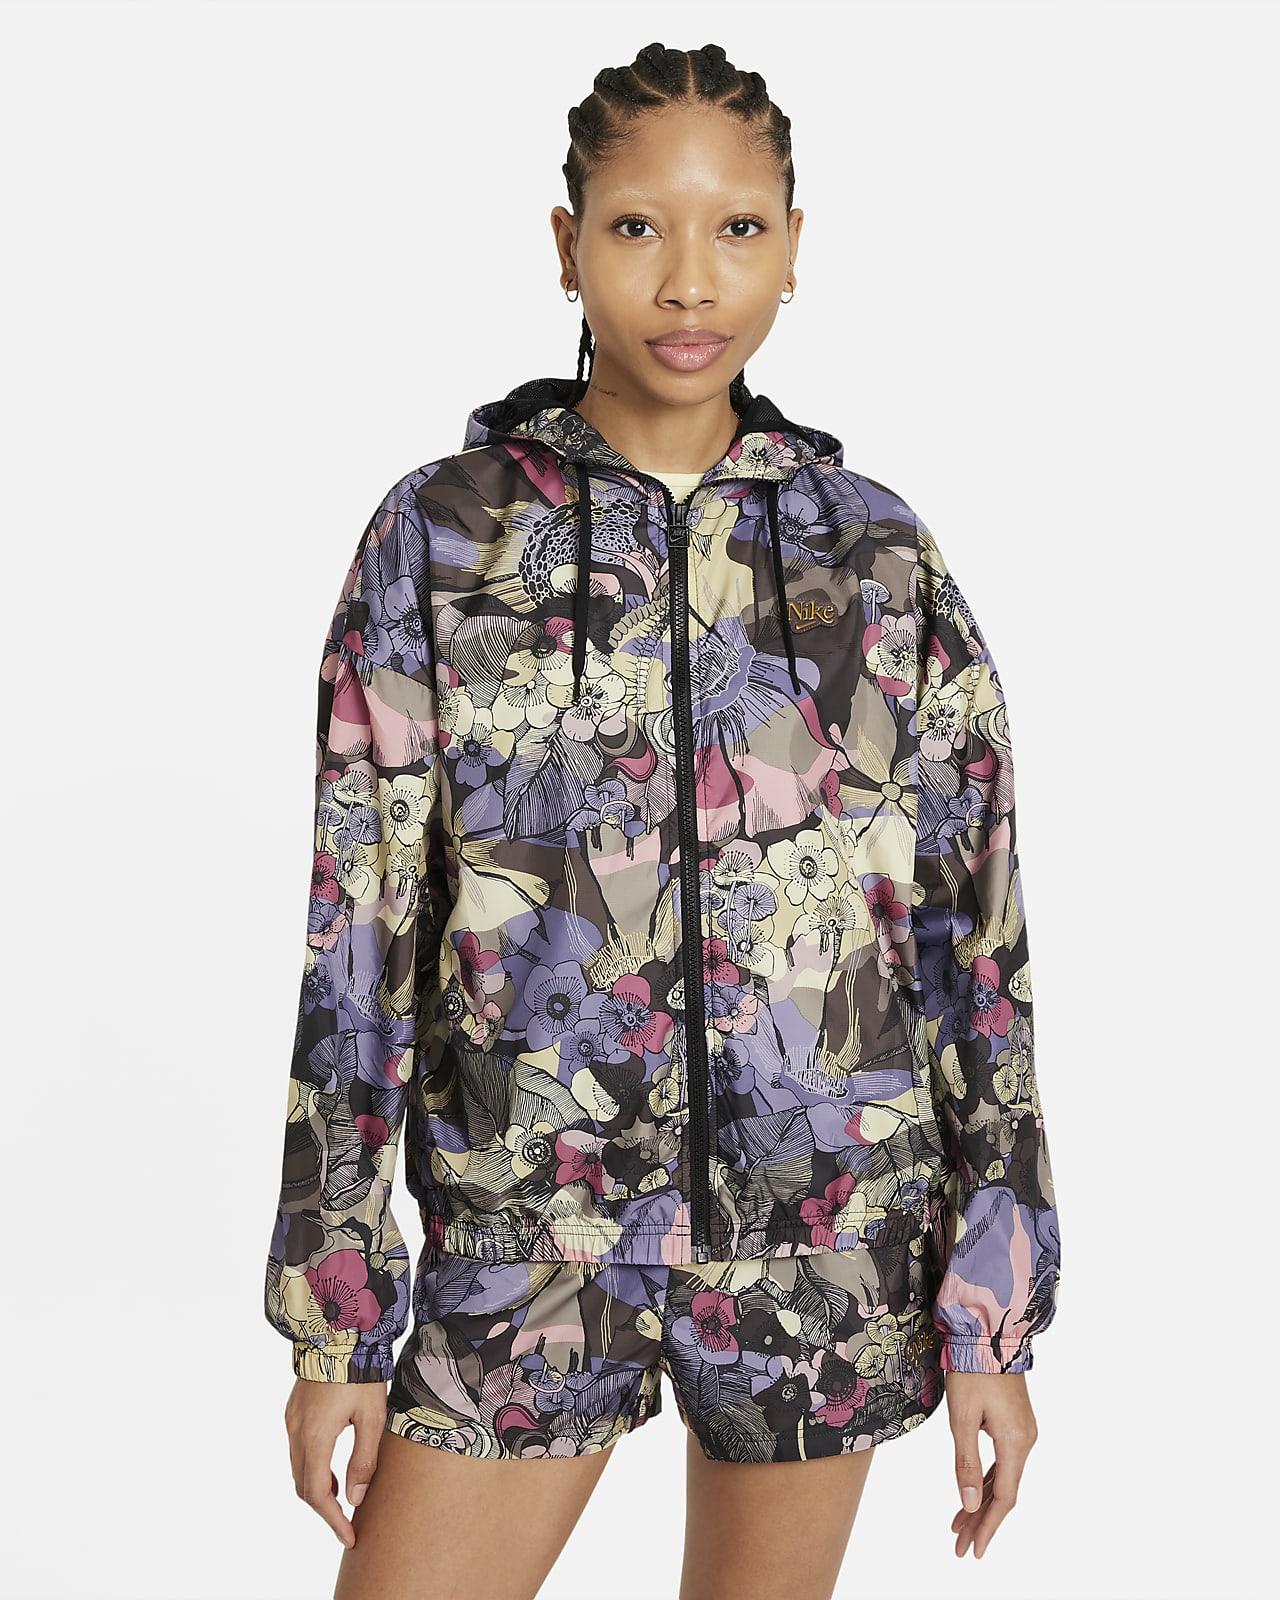 Chamarra para mujer Nike Sportswear Femme